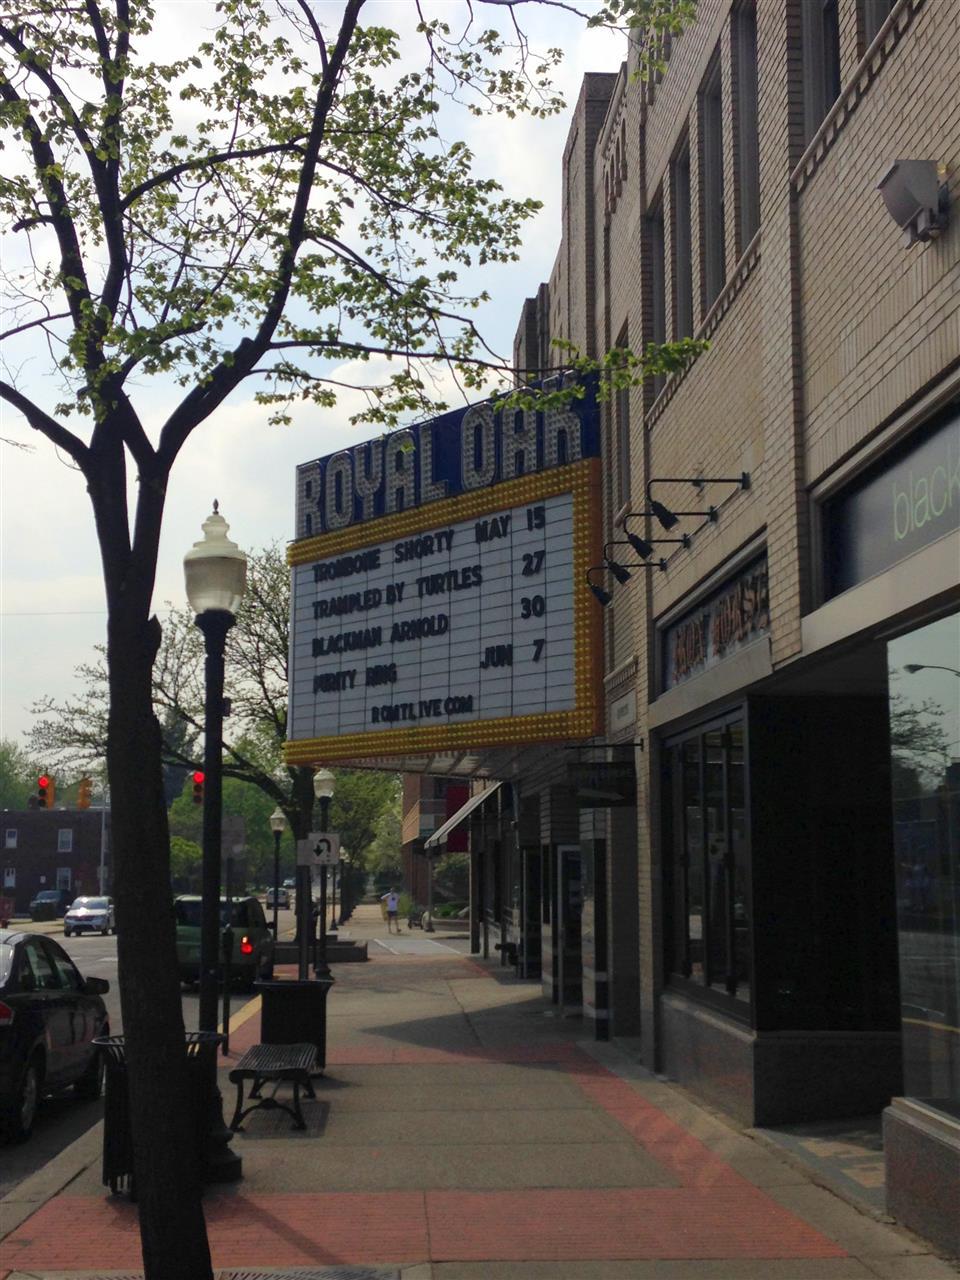 Royal Oak Music Theatre ~ Royal Oak, Michigan #LeadingRElocal #RoyalOak #Michigan